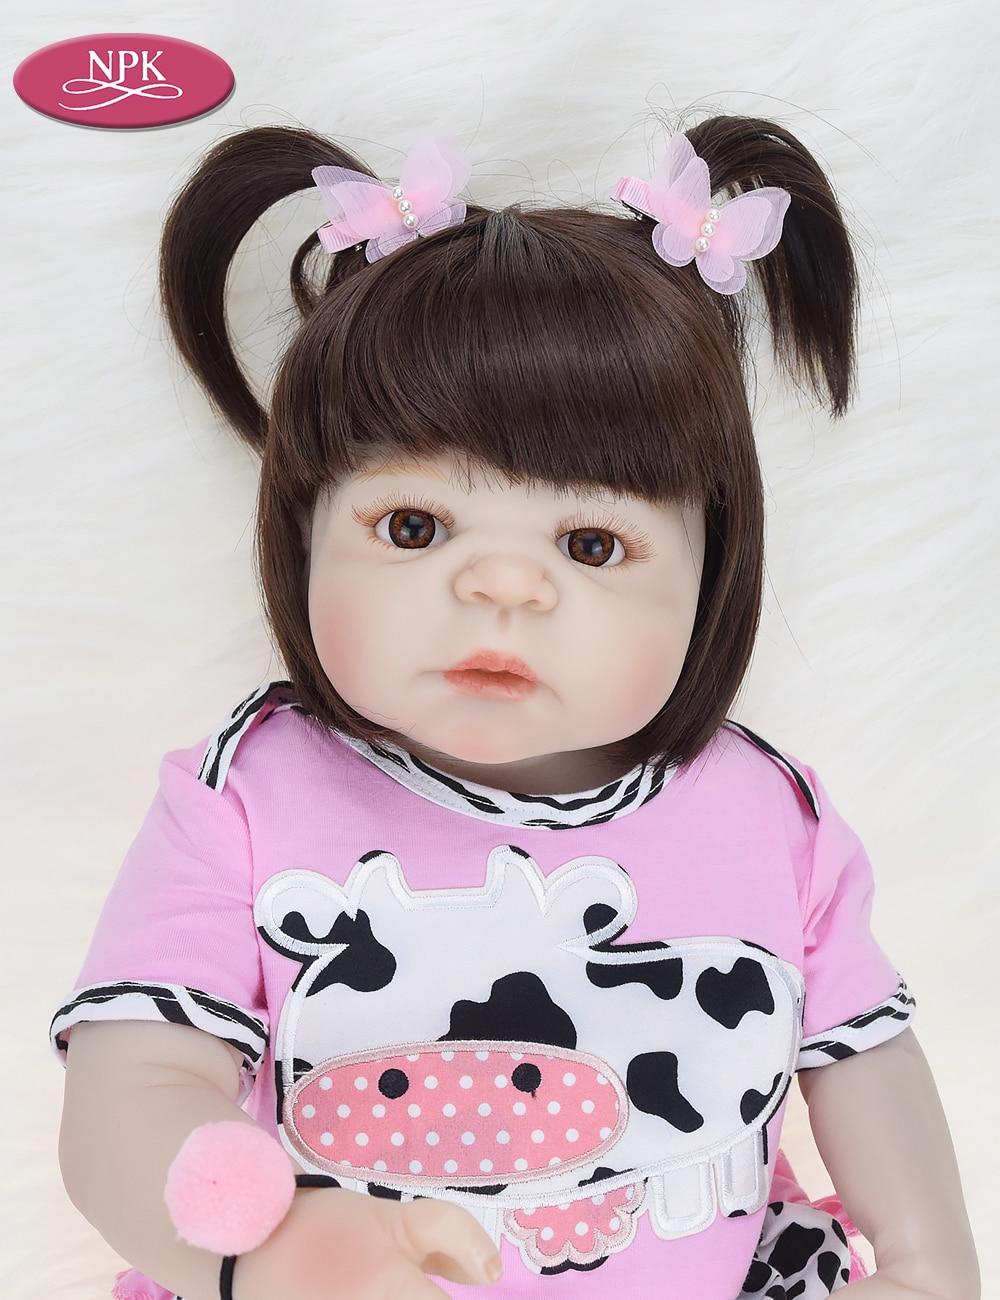 NPK Real 57CM Full Body SIlicone Girl Reborn Babies Doll Bath Toy Lifelike Newborn Princess Baby Doll Bonecas Bebe Reborn Menina (16)